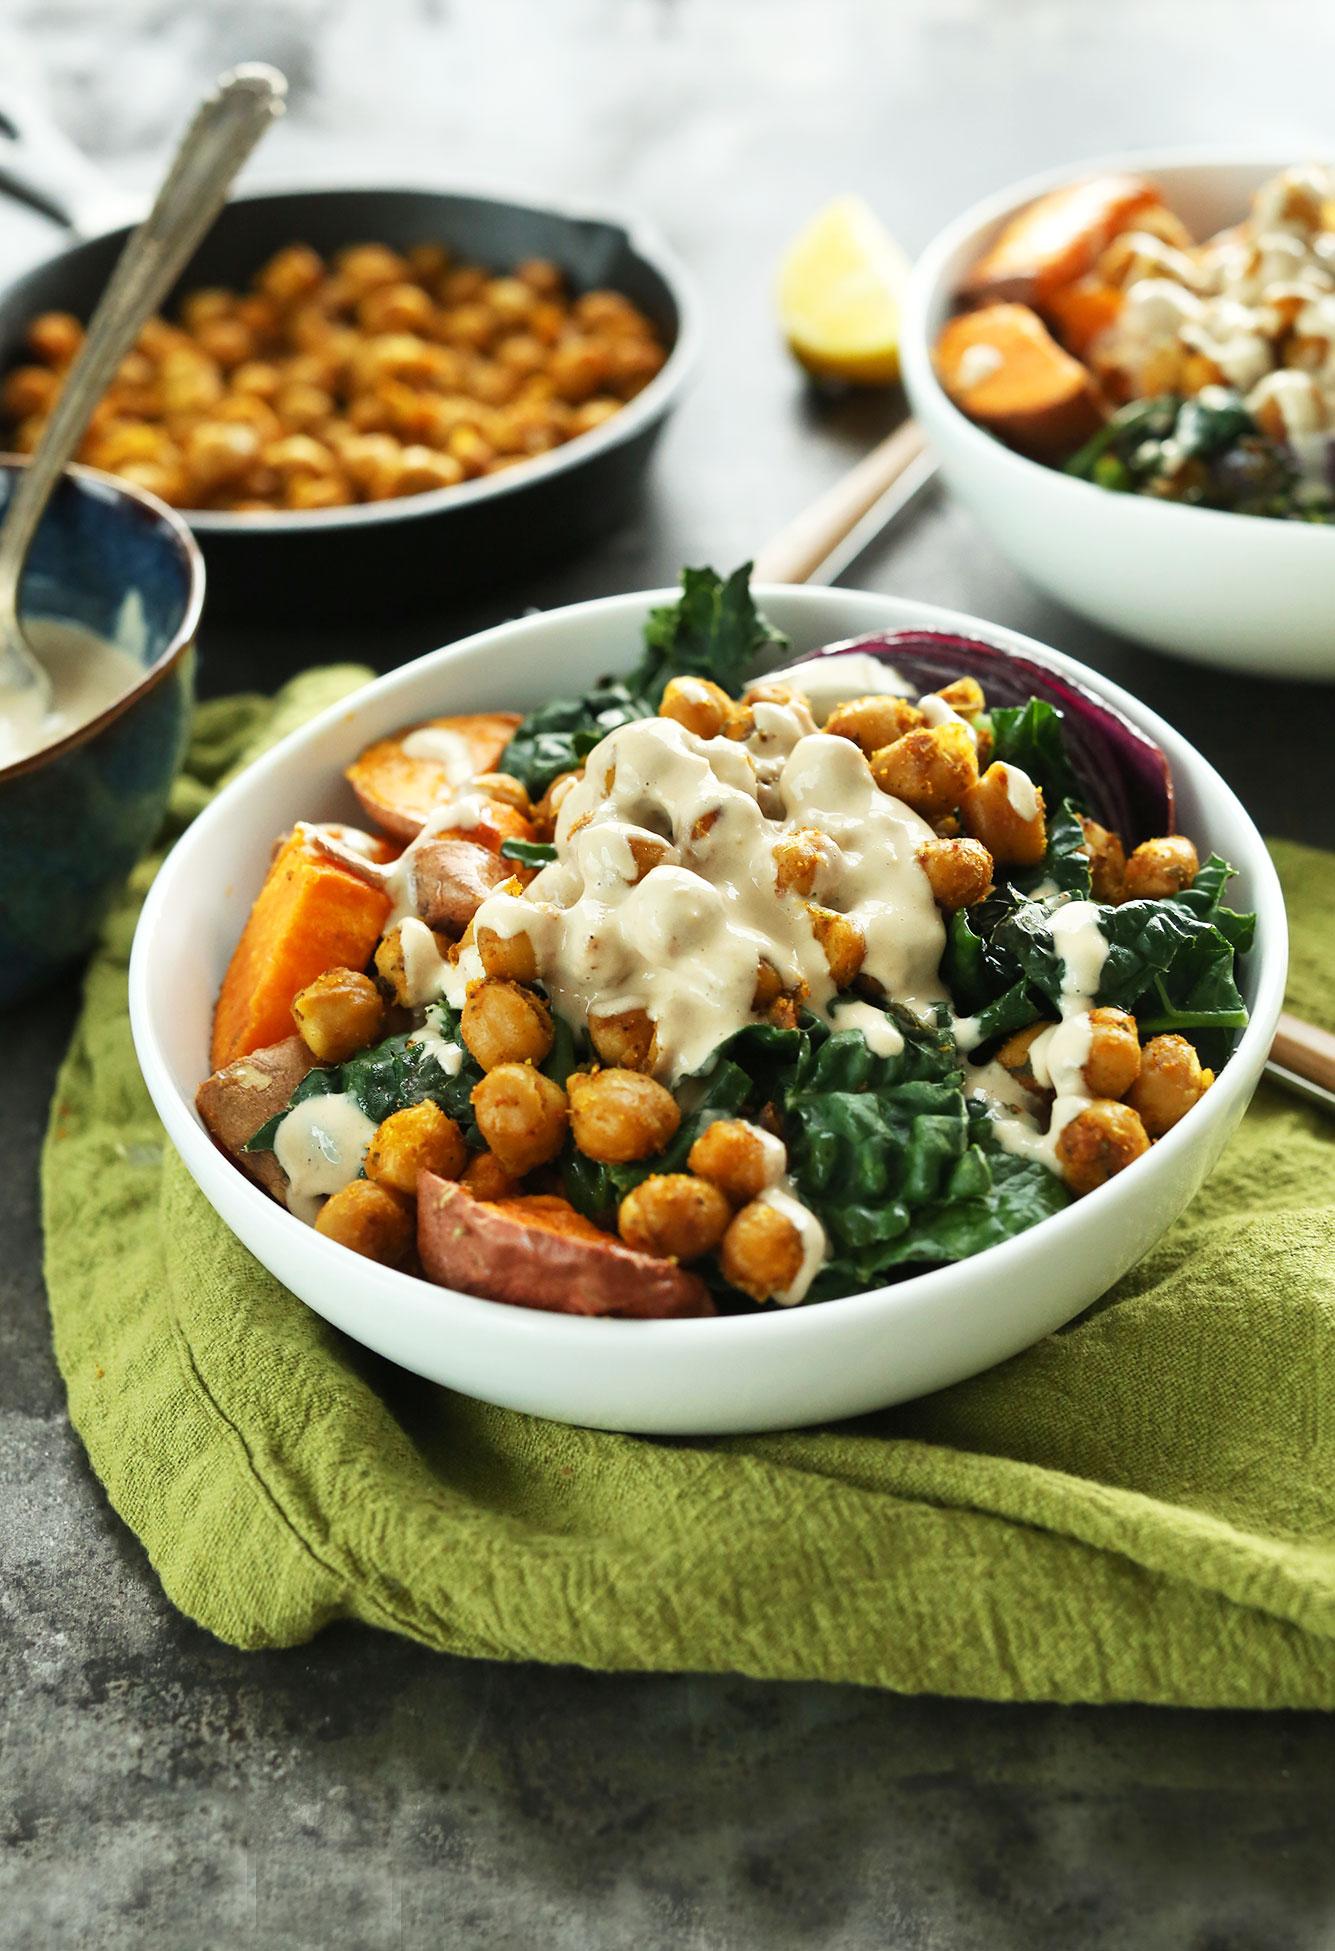 AMAZING Sweet Potato Chickpea Buddha Bowl with Kale, Red Onion, and a STUNNING Tahini-maple sauce! #vegan #glutenfree #dinner #minimalistbaker